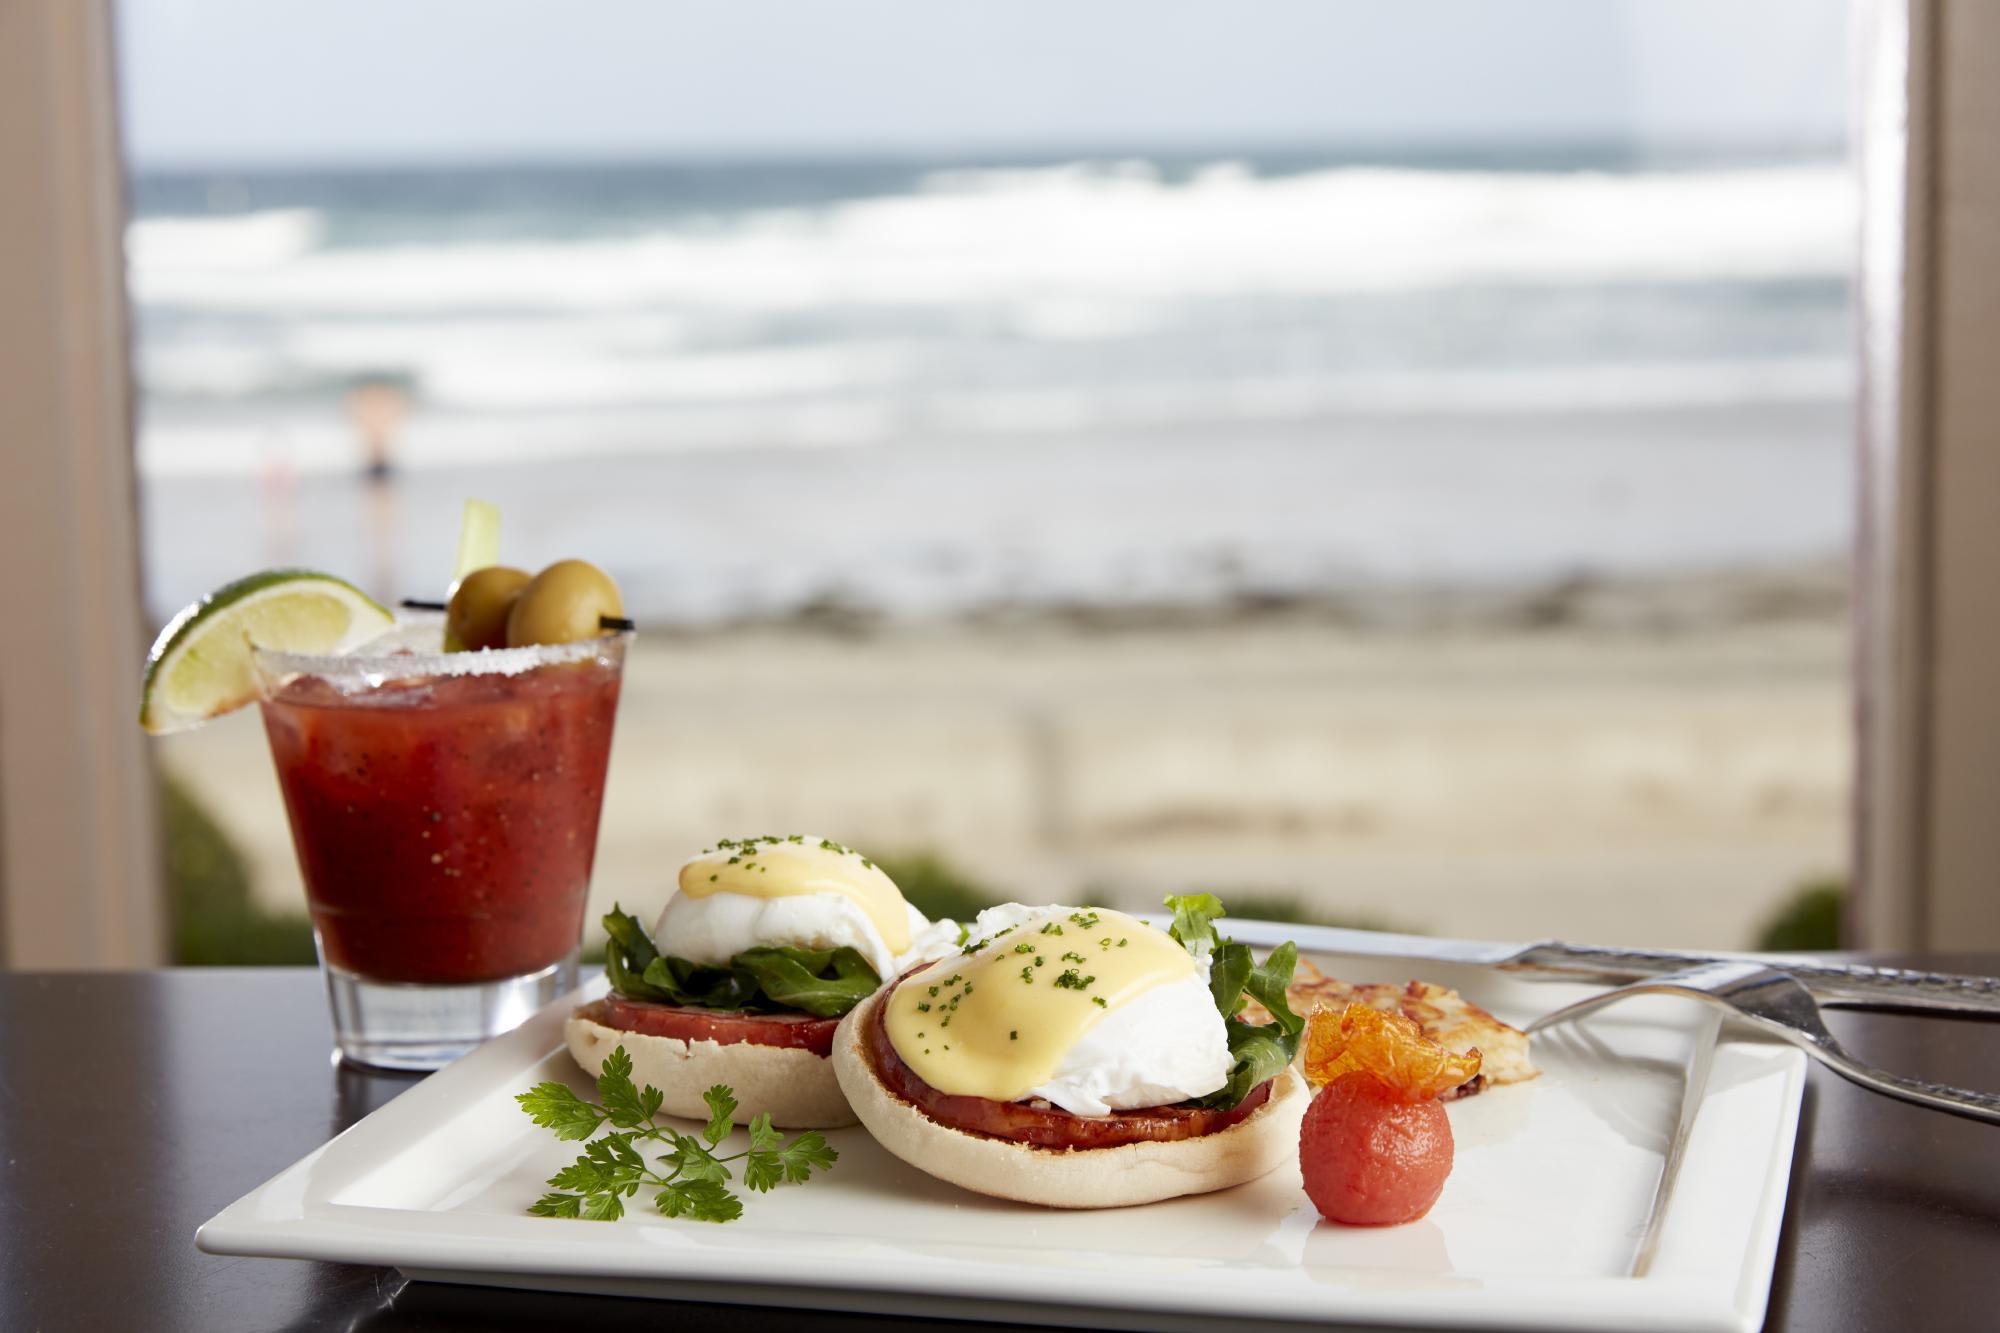 Eggs Benedict : 14.75 canadian bacon, arugula, english muffin, citrus hollandaise at Shores Restaurant, The